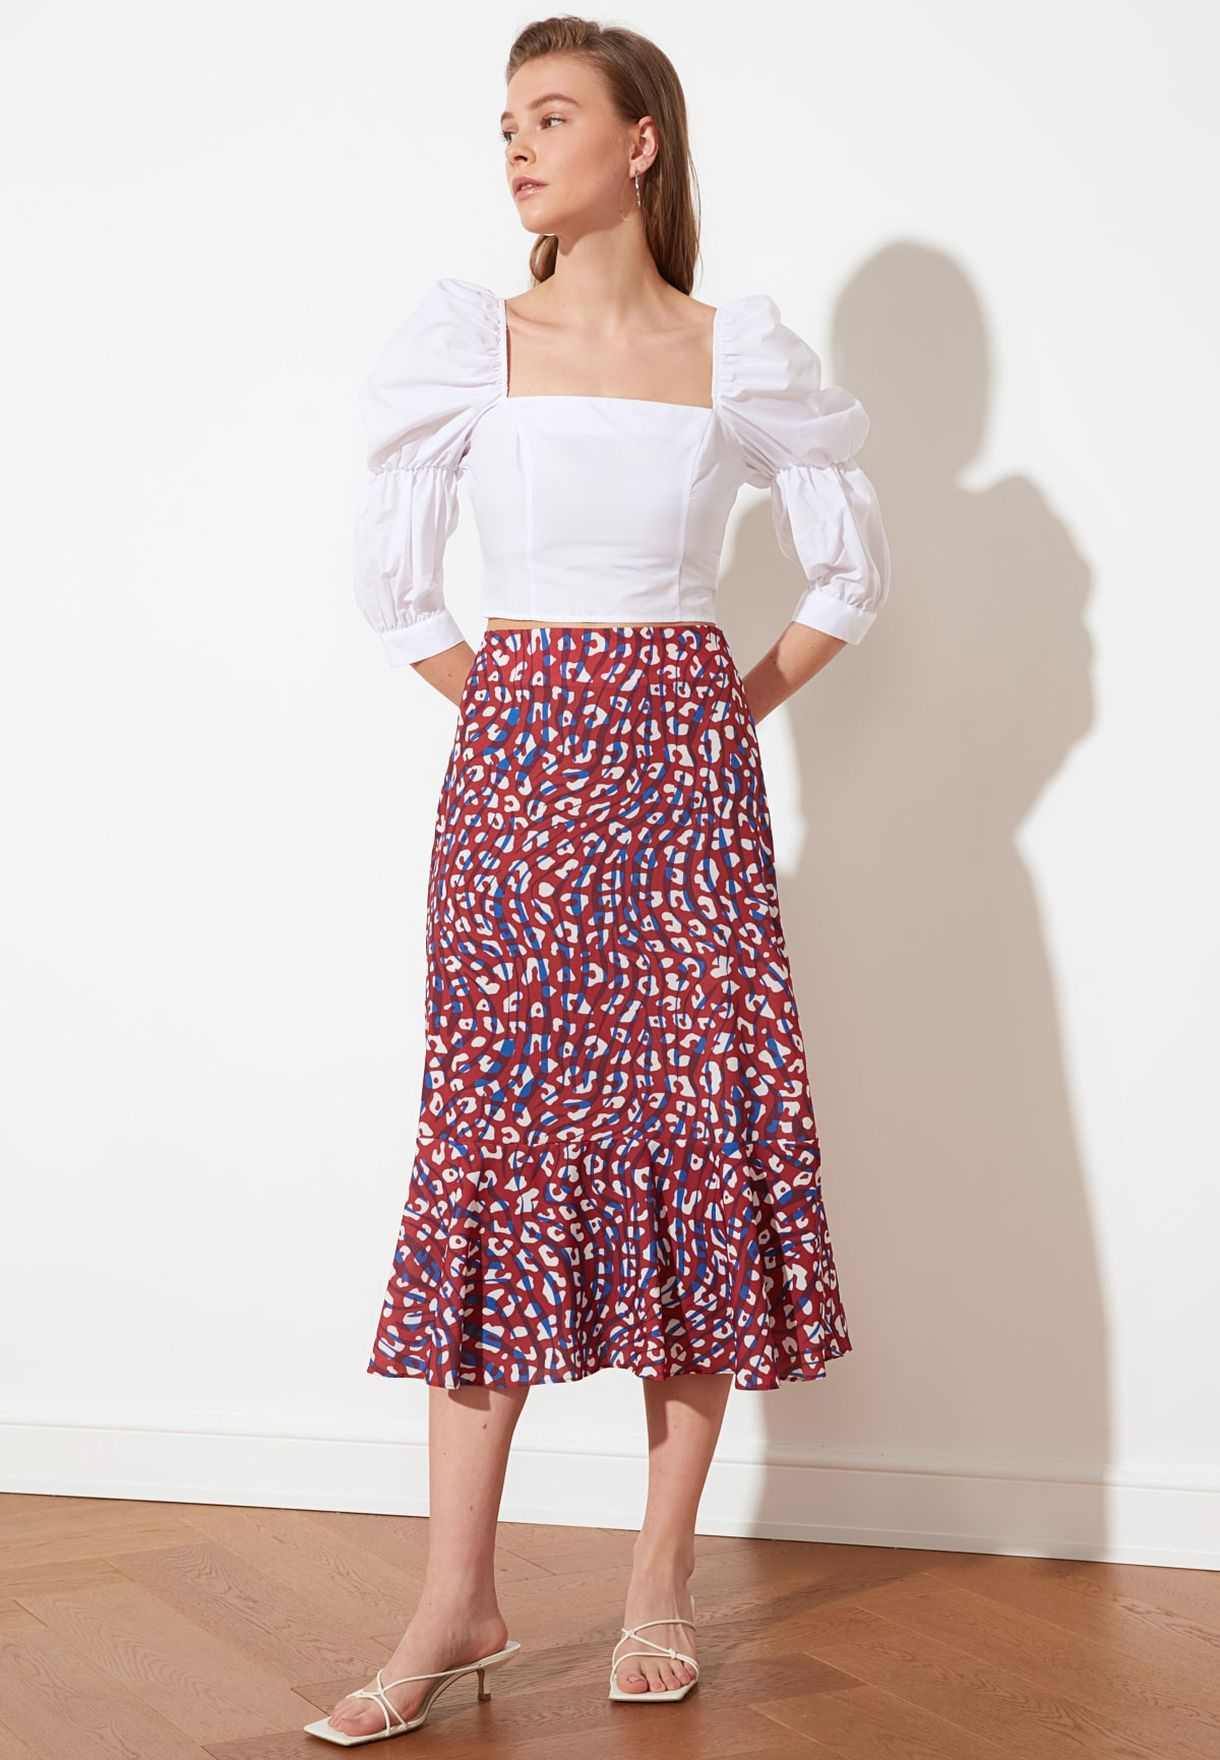 c9b21de899 Shop Trendyol prints High Waist Printed Skirt TWOSS19FG0026 for ...